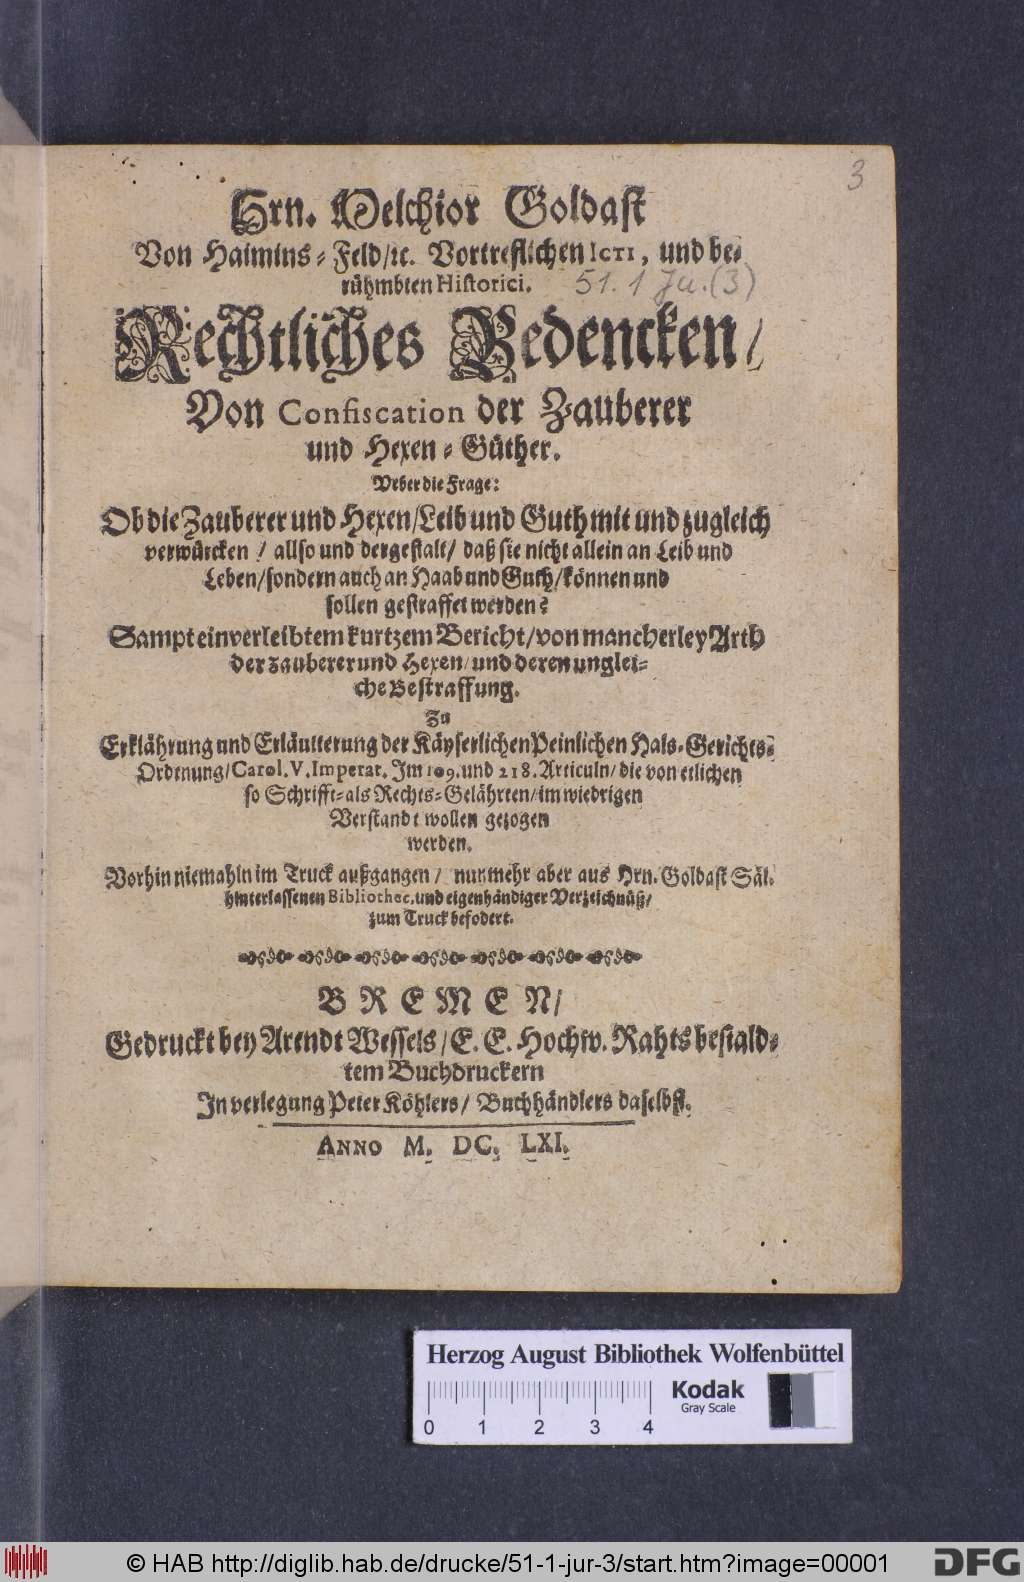 http://diglib.hab.de/drucke/51-1-jur-3/00001.jpg